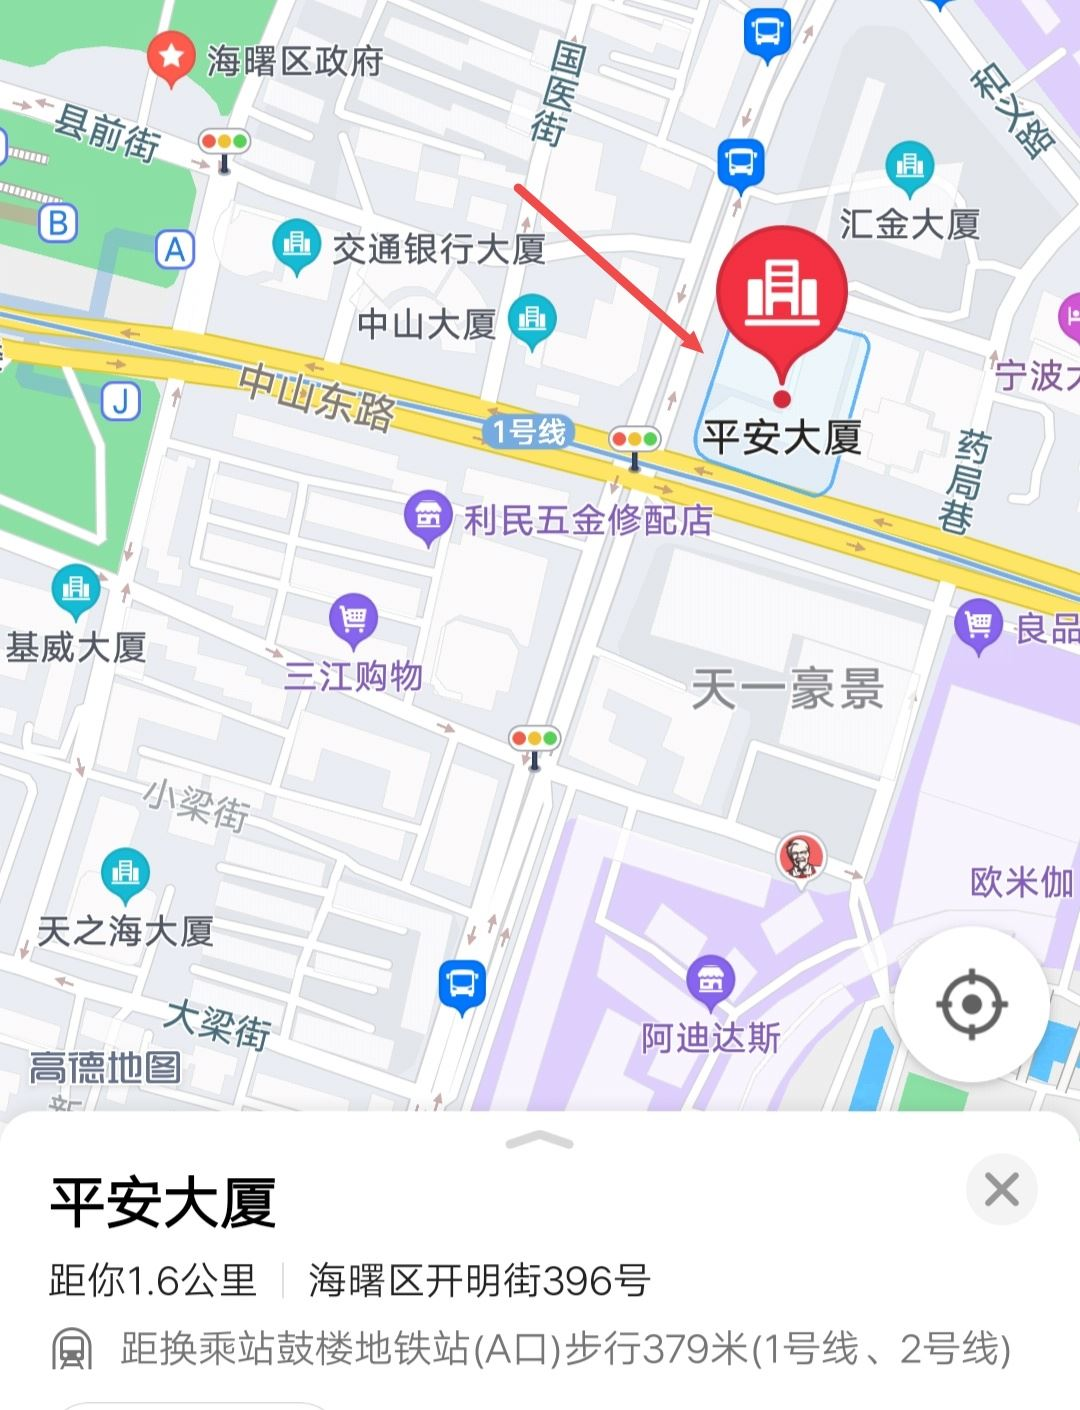 http://www.huodongxing.com/file/20190114/1133300437025/314030563462200.jpg